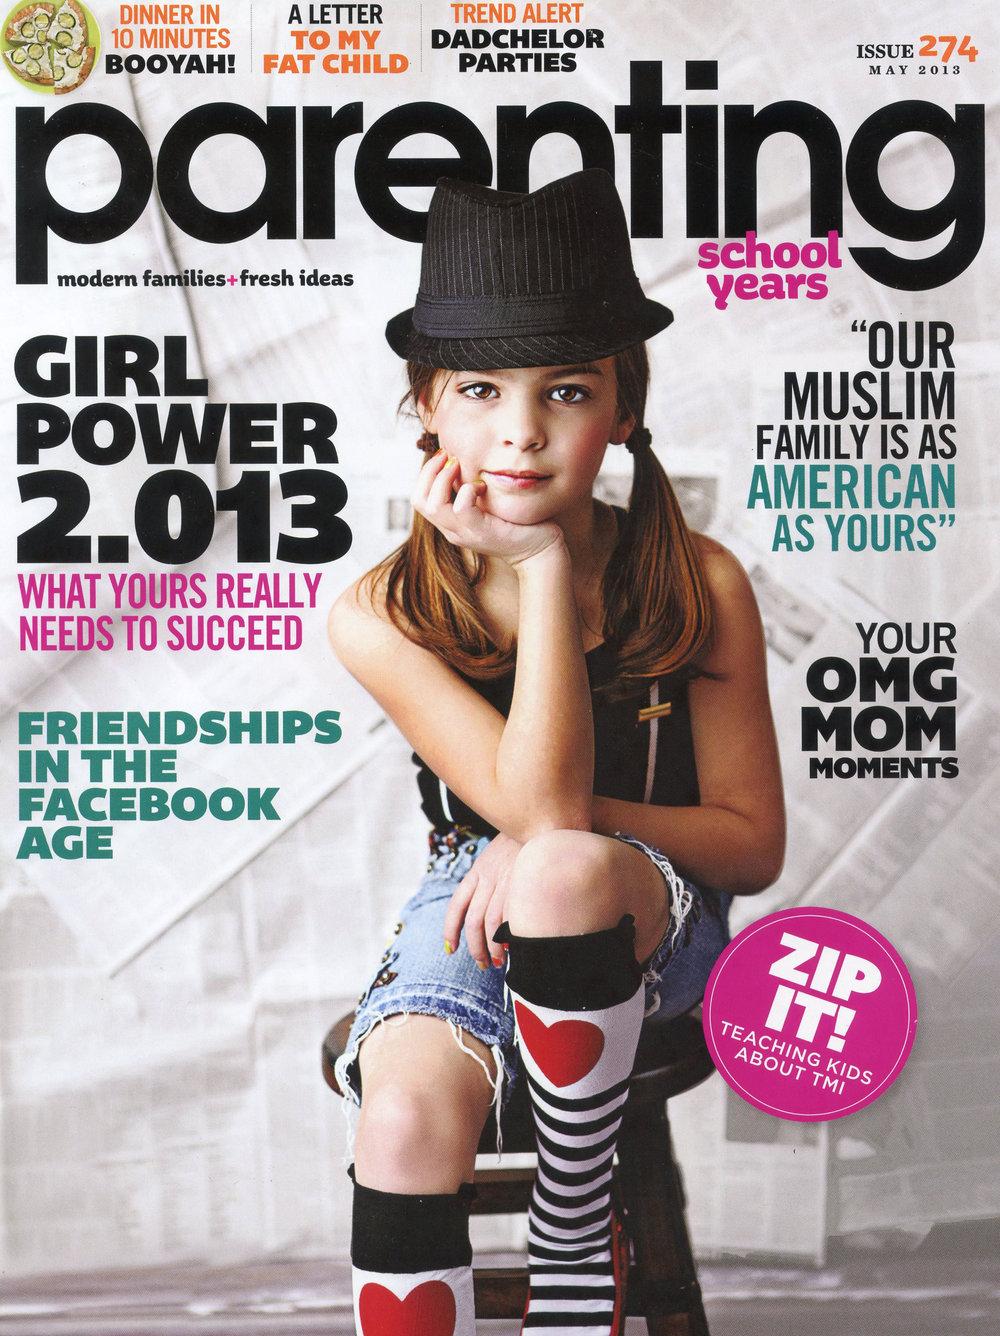 Parenting007.jpg